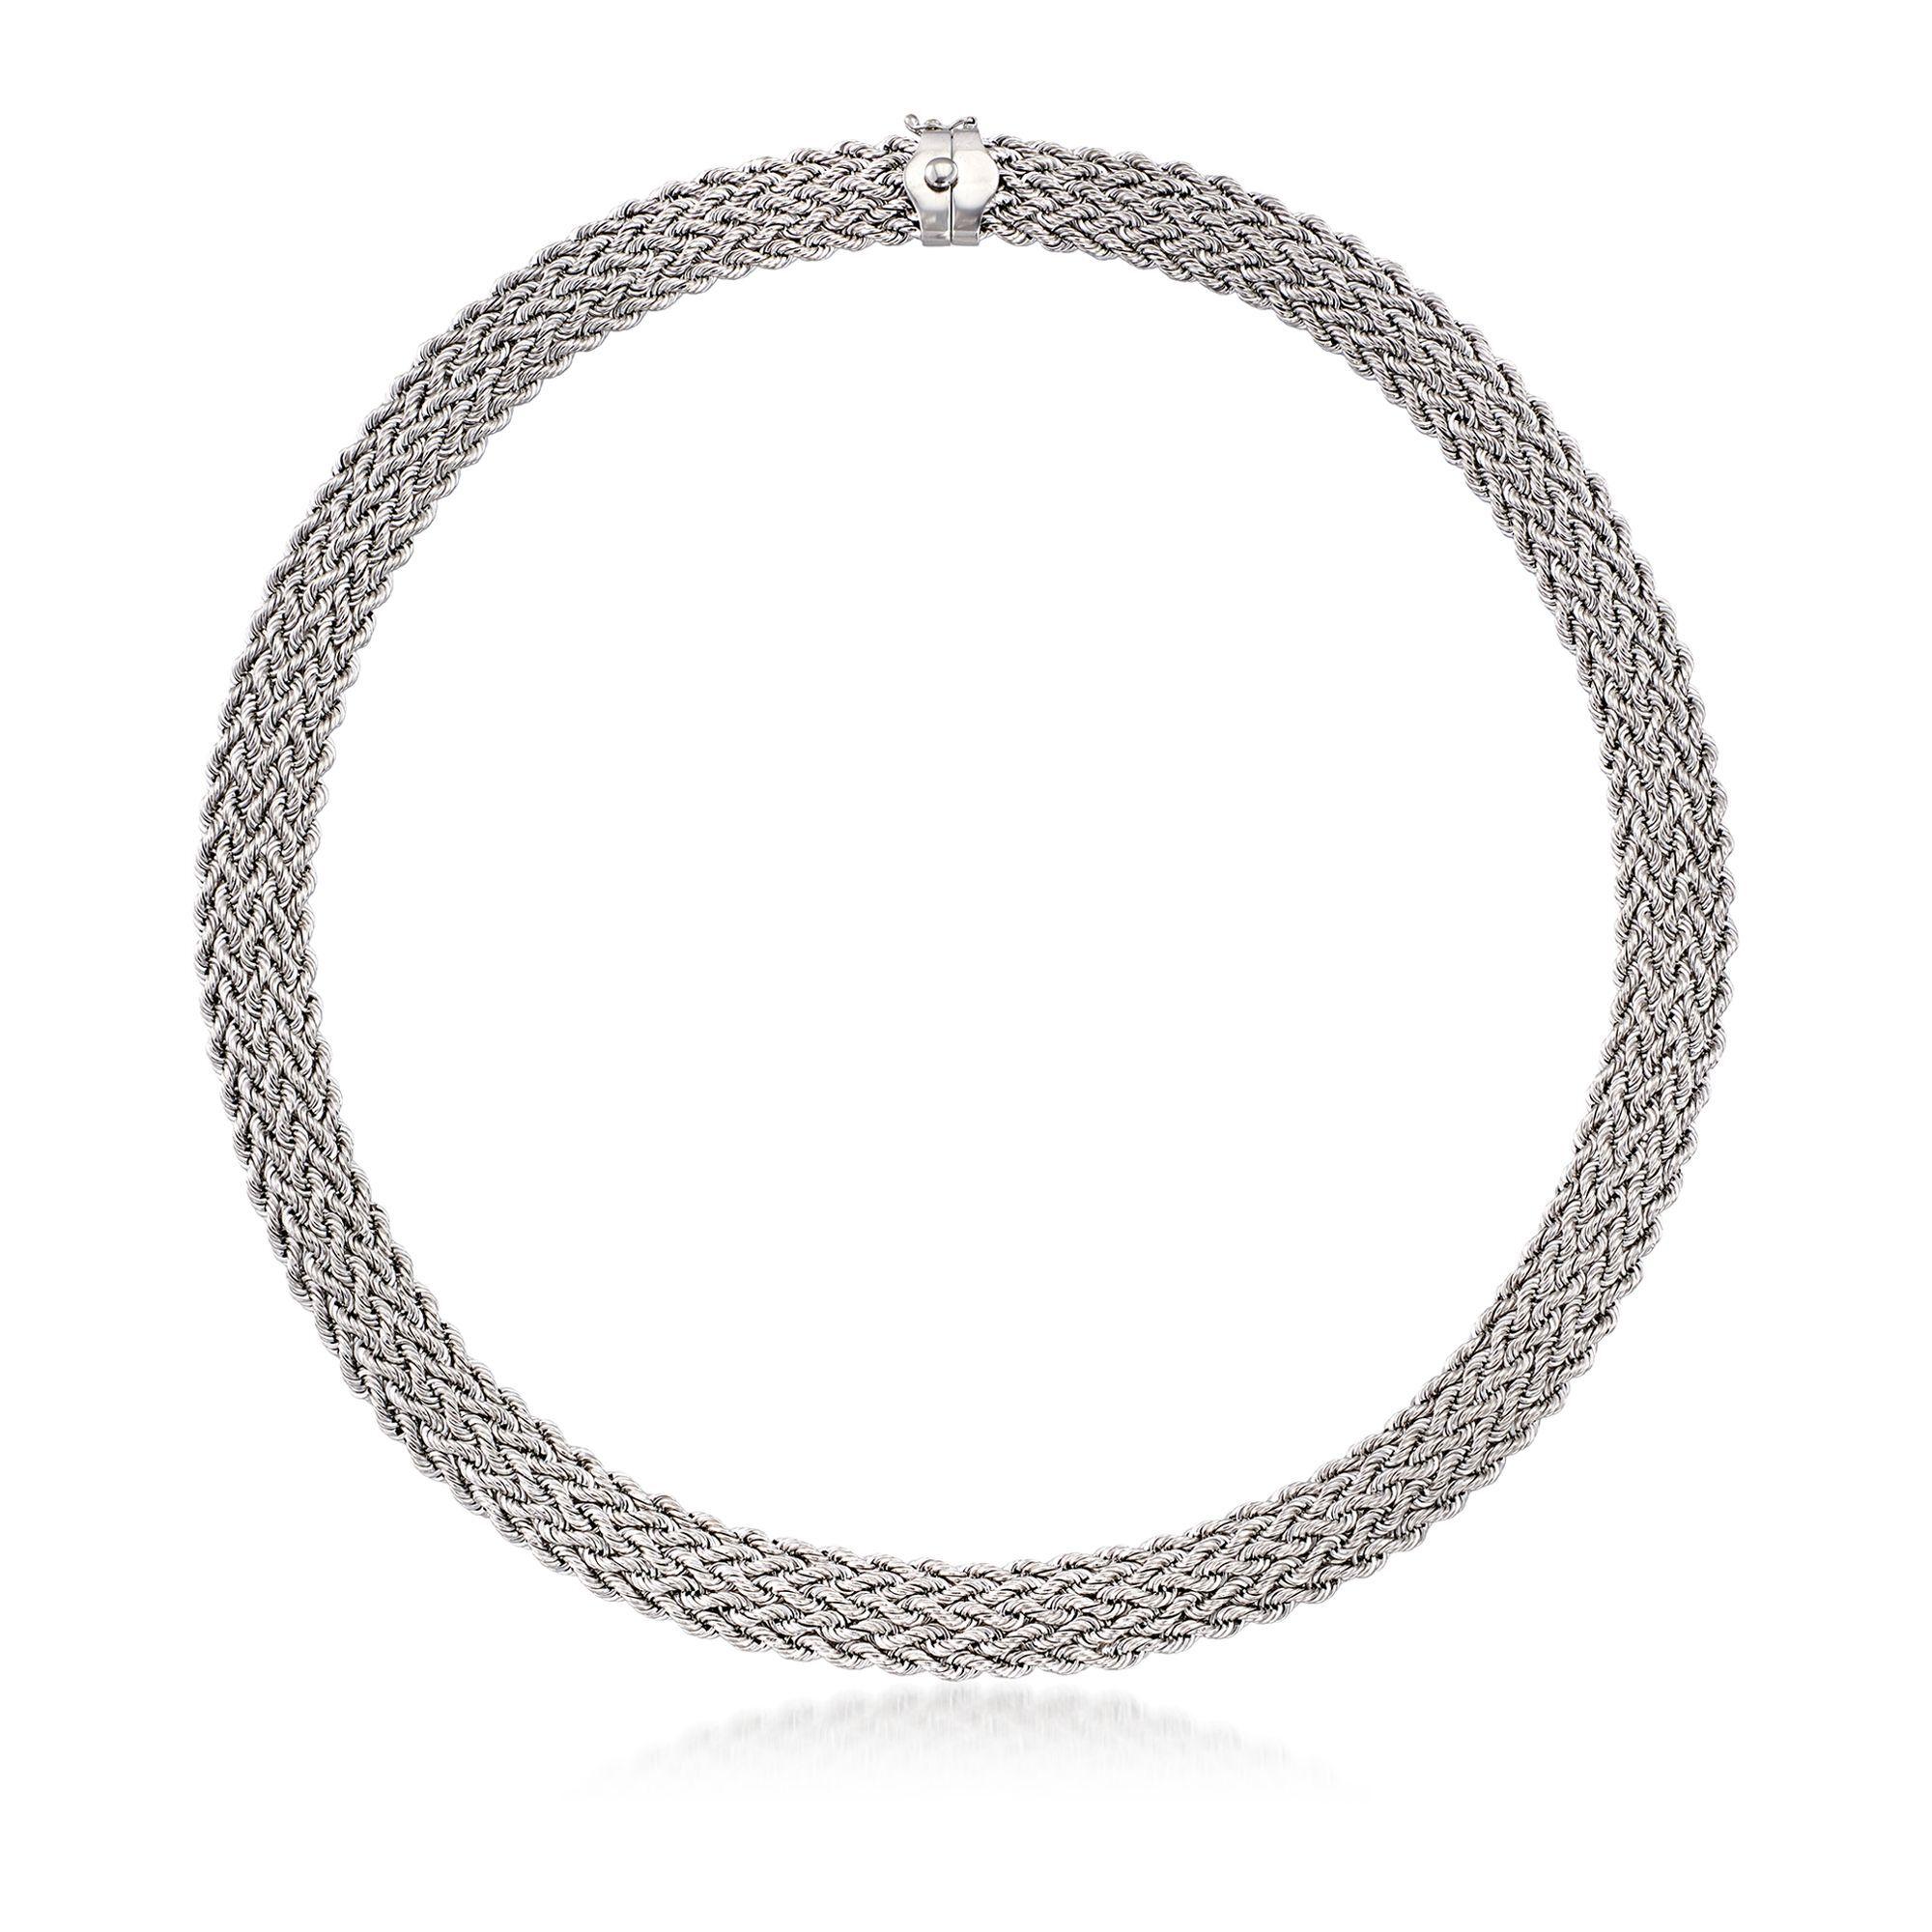 Active New Wedding Jewelry Ss W/ Pearls & Swarvoski Crystals Necklace Bridal & Wedding Party Jewelry